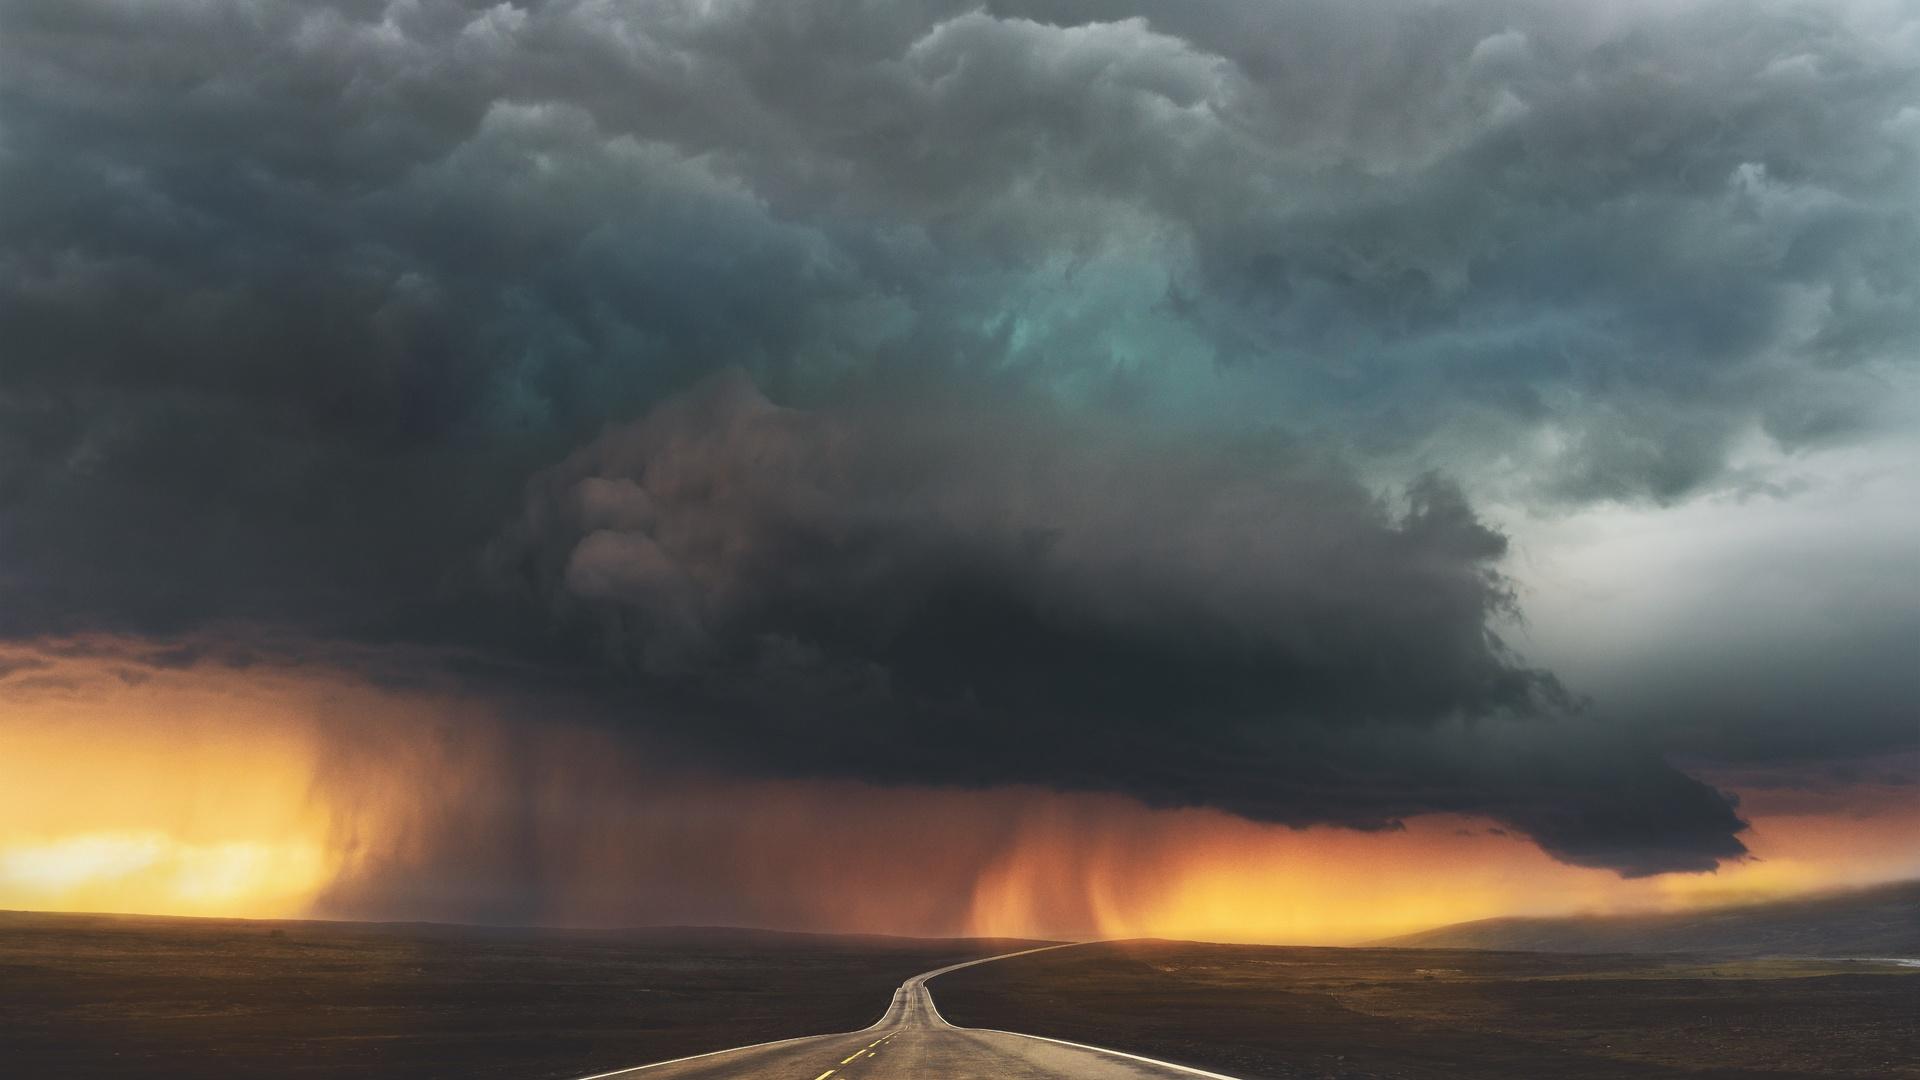 пейзаж, шторм, дорога, небо, тучи